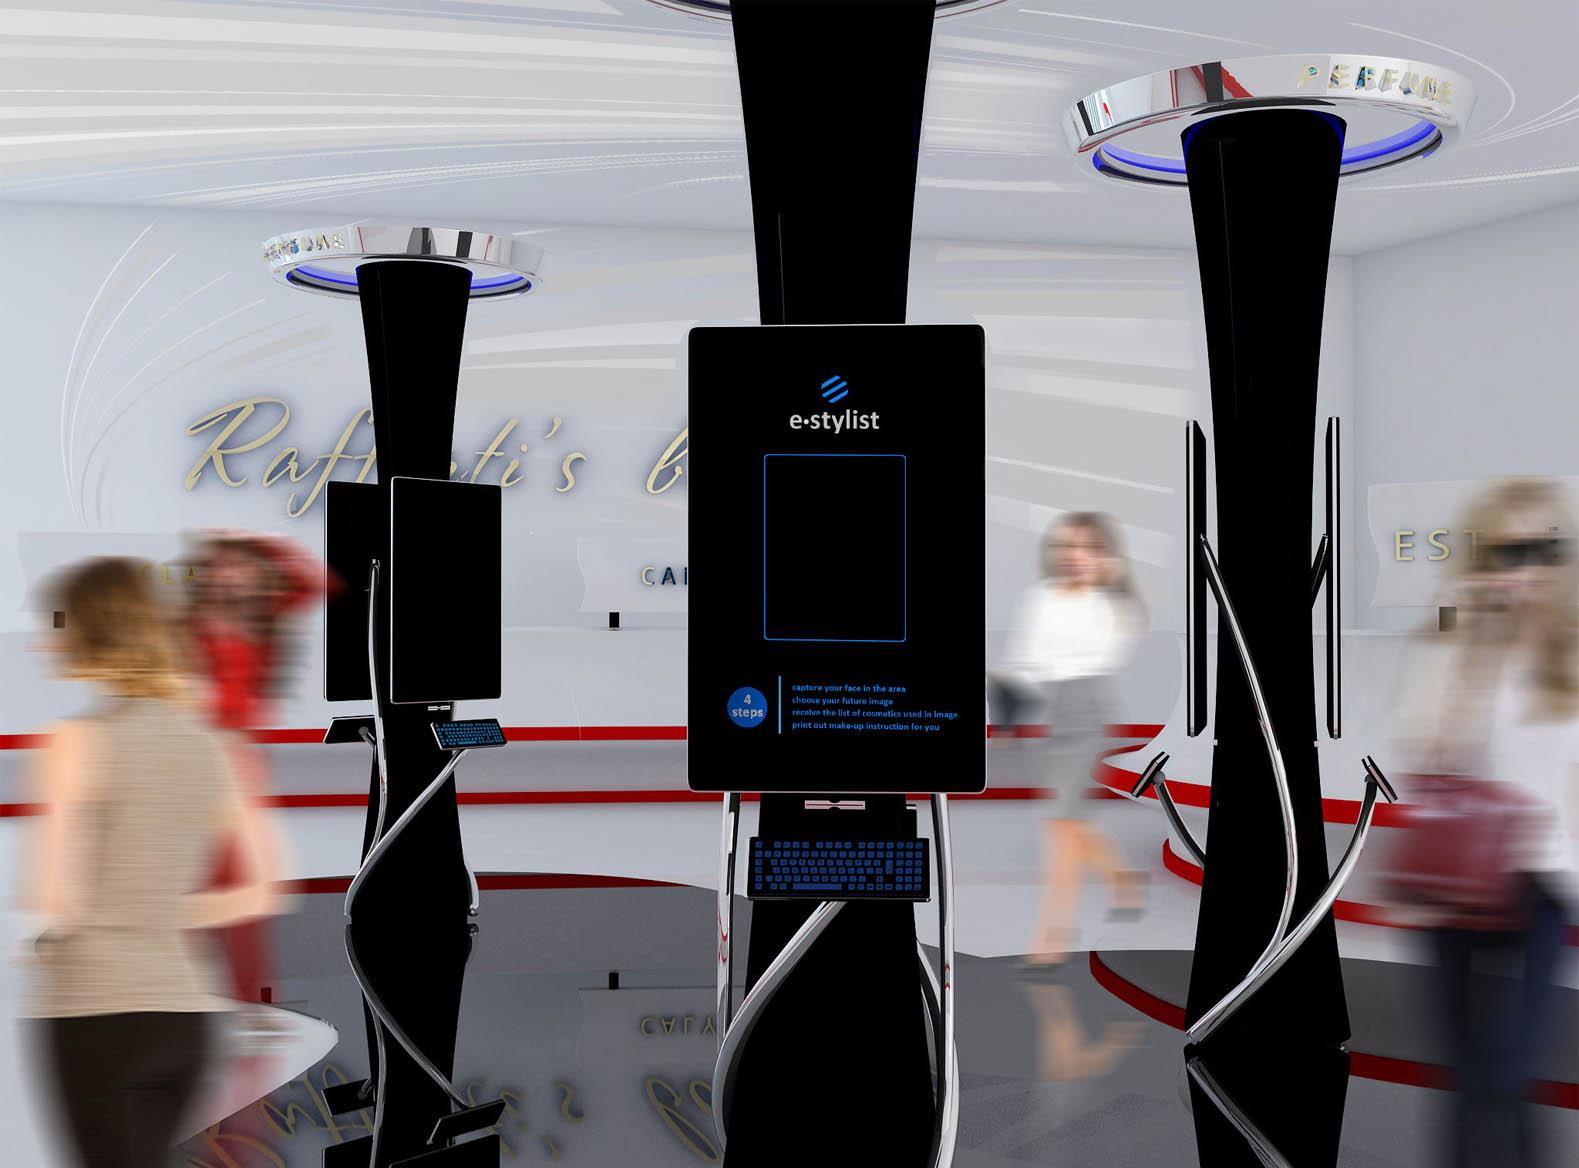 vending machine design service stas qlare shvechkov